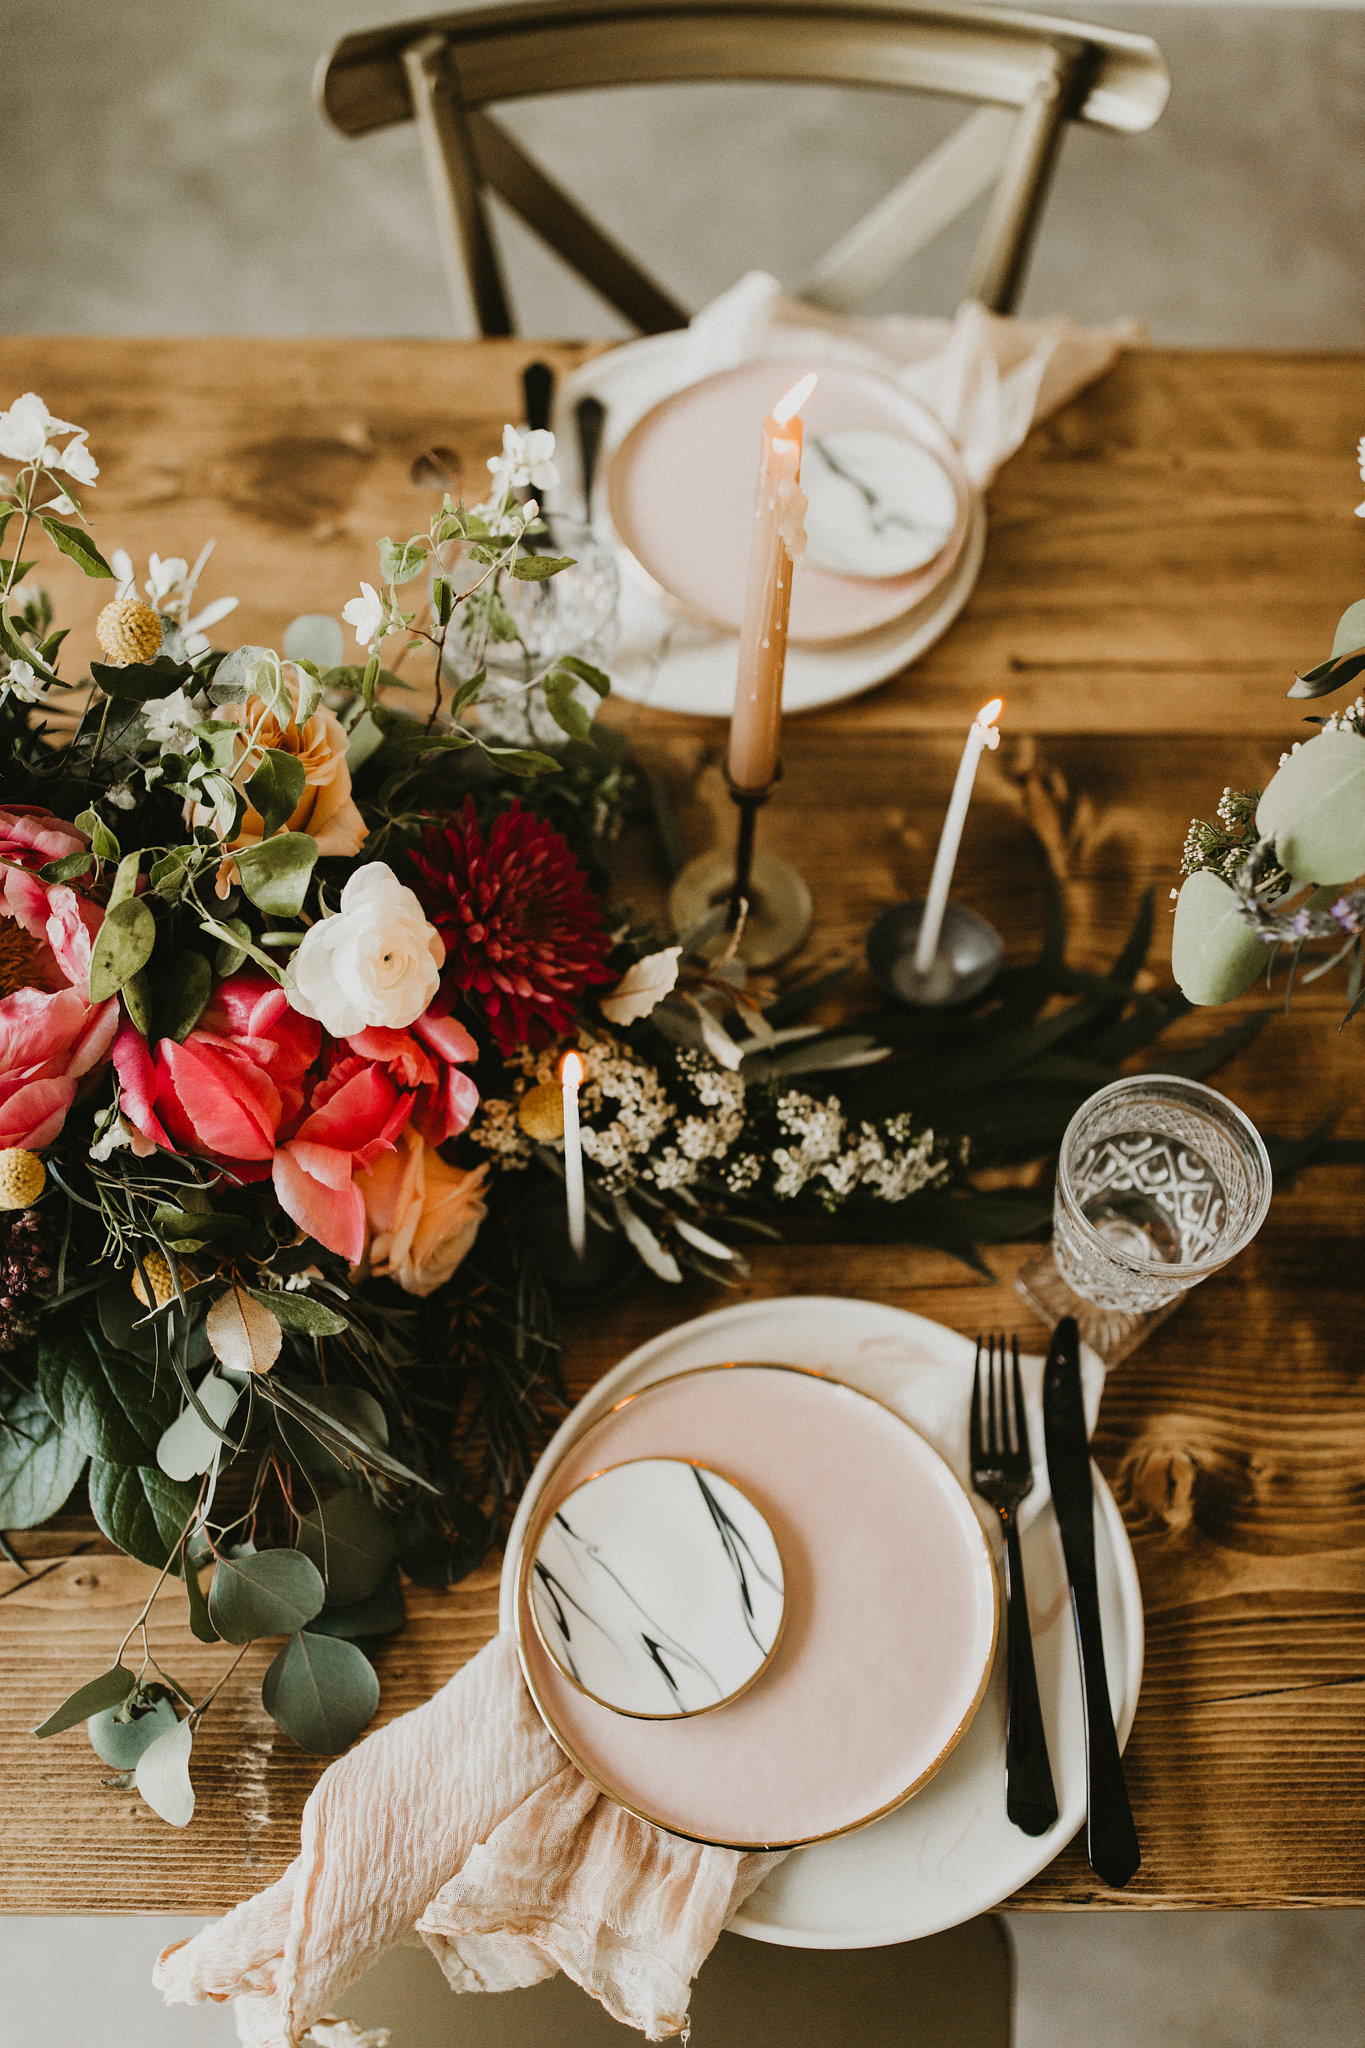 blush pink plate wedding eliana bernard - epoch co austin wedding coordinator